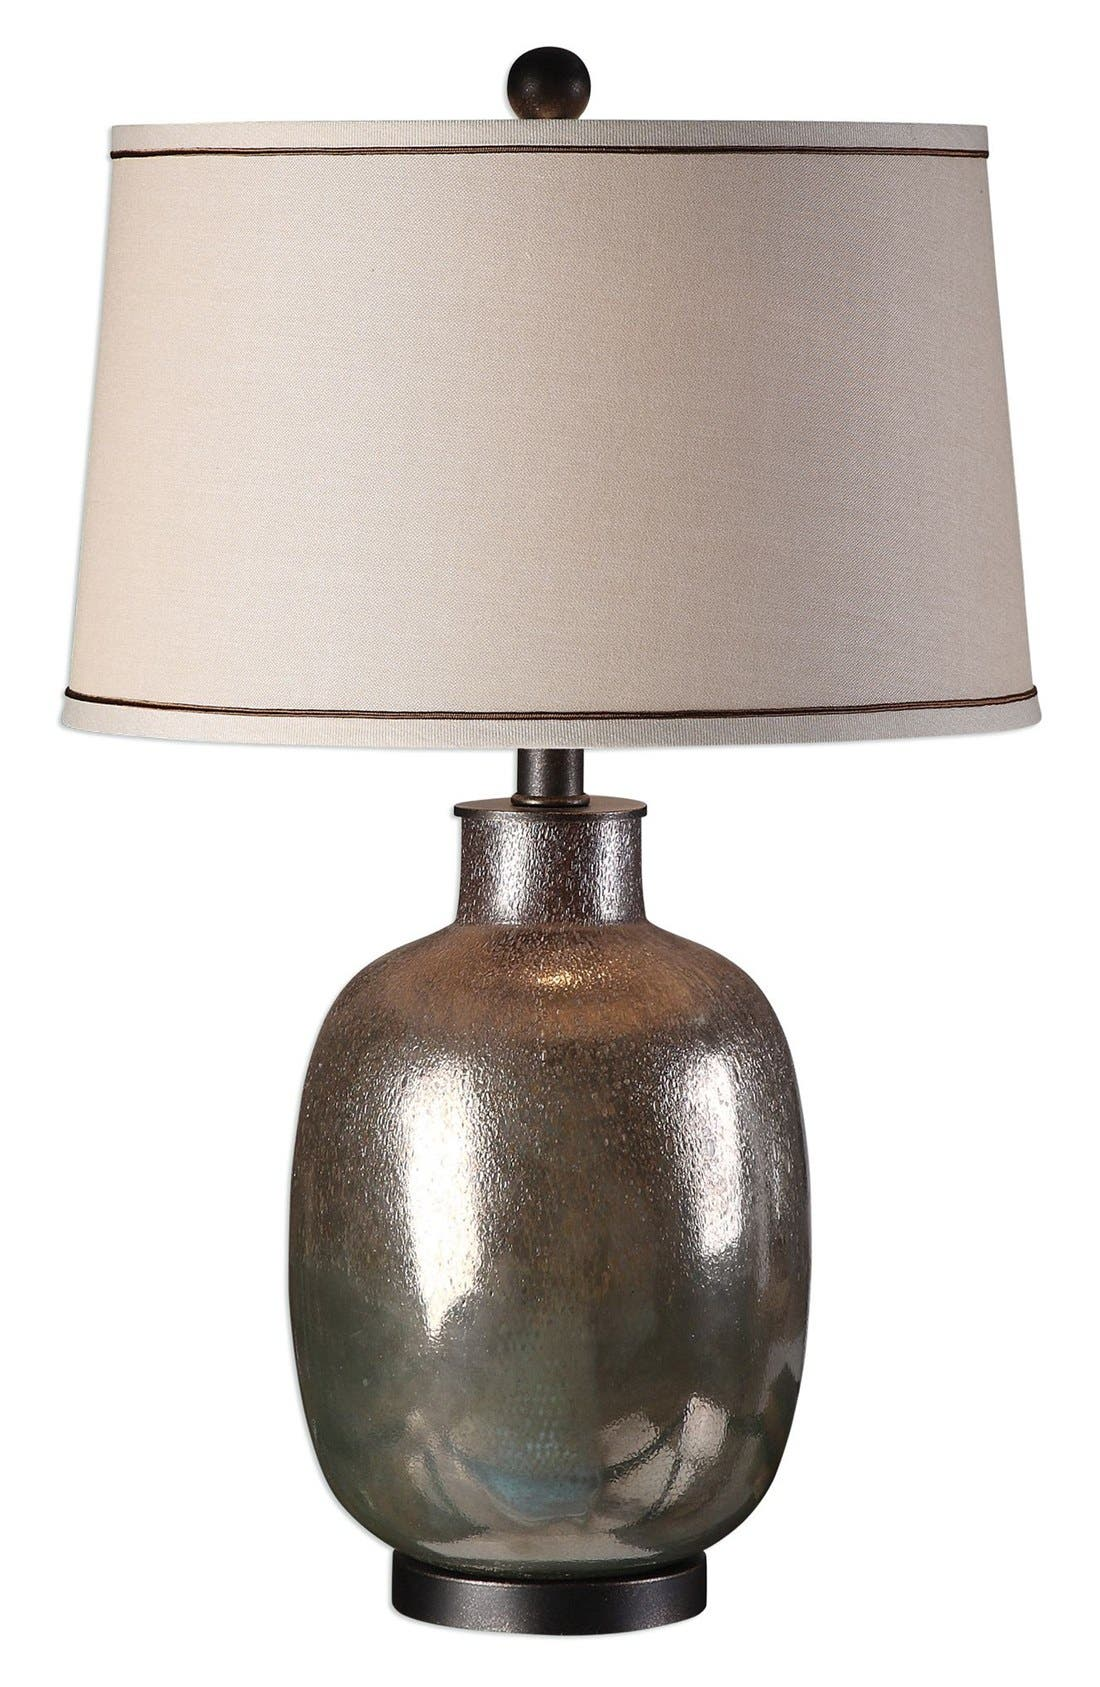 Main Image - Uttermost Glazed Glass Table Lamp